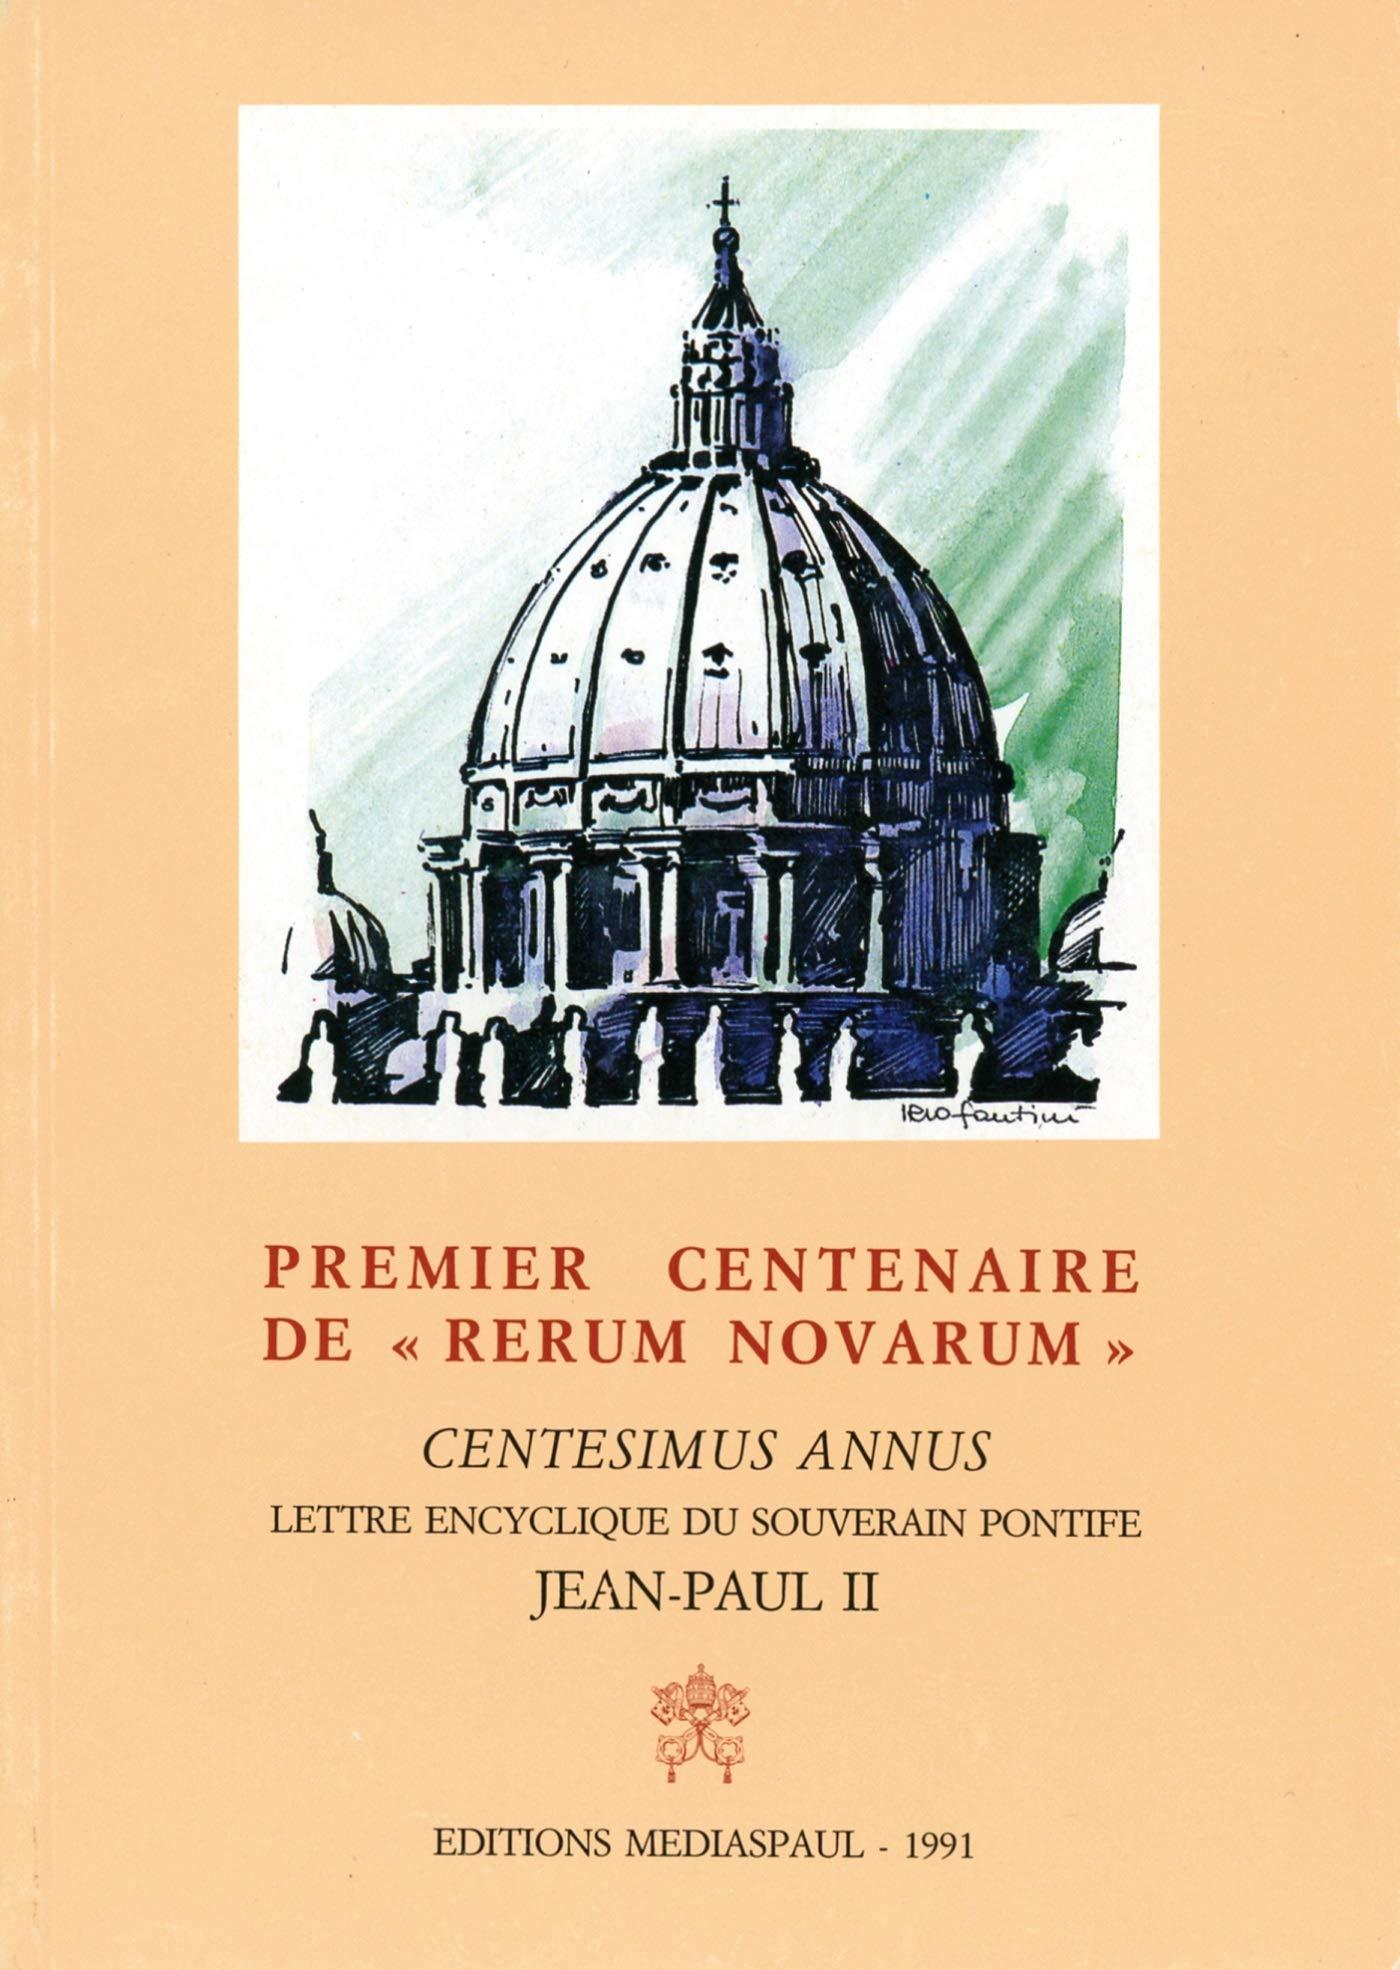 Centesimus annus : Jean-paul, Ii karol wojtyla: Amazon.es: Libros